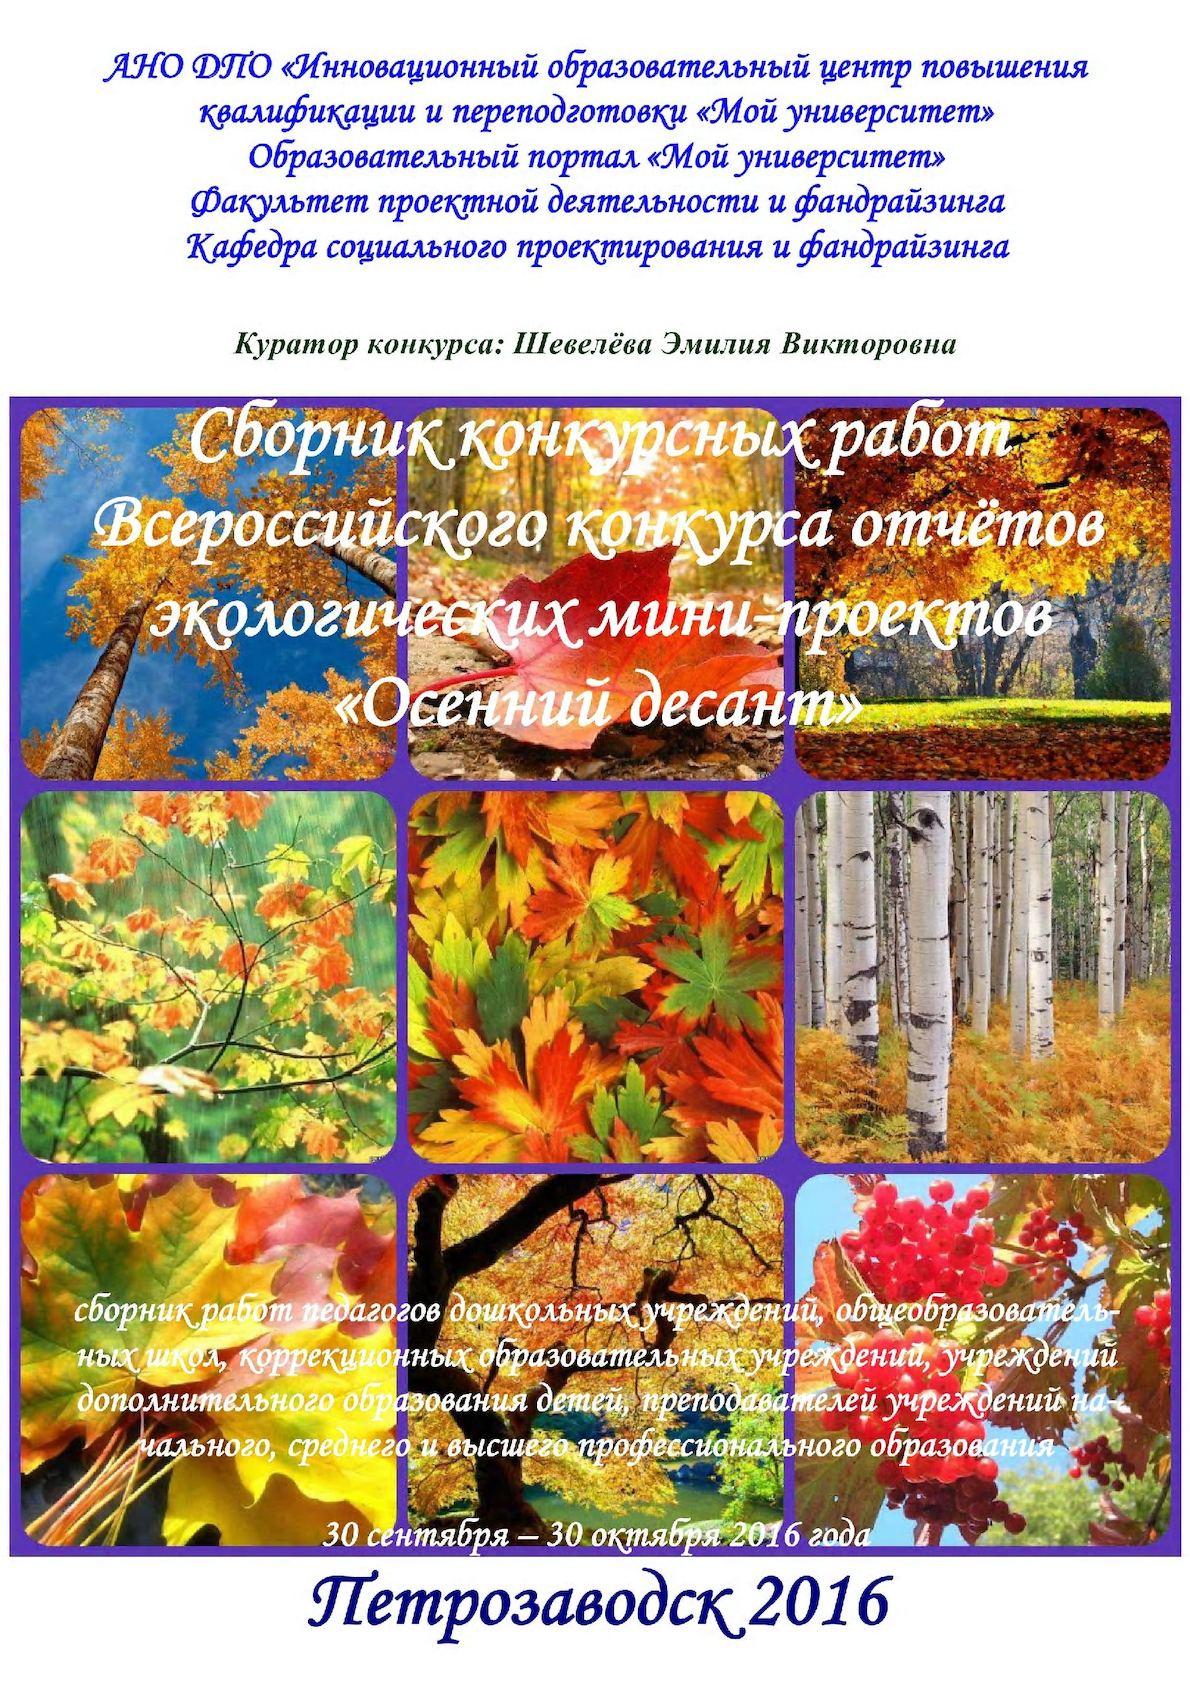 Сборник конкурса Осенний десант